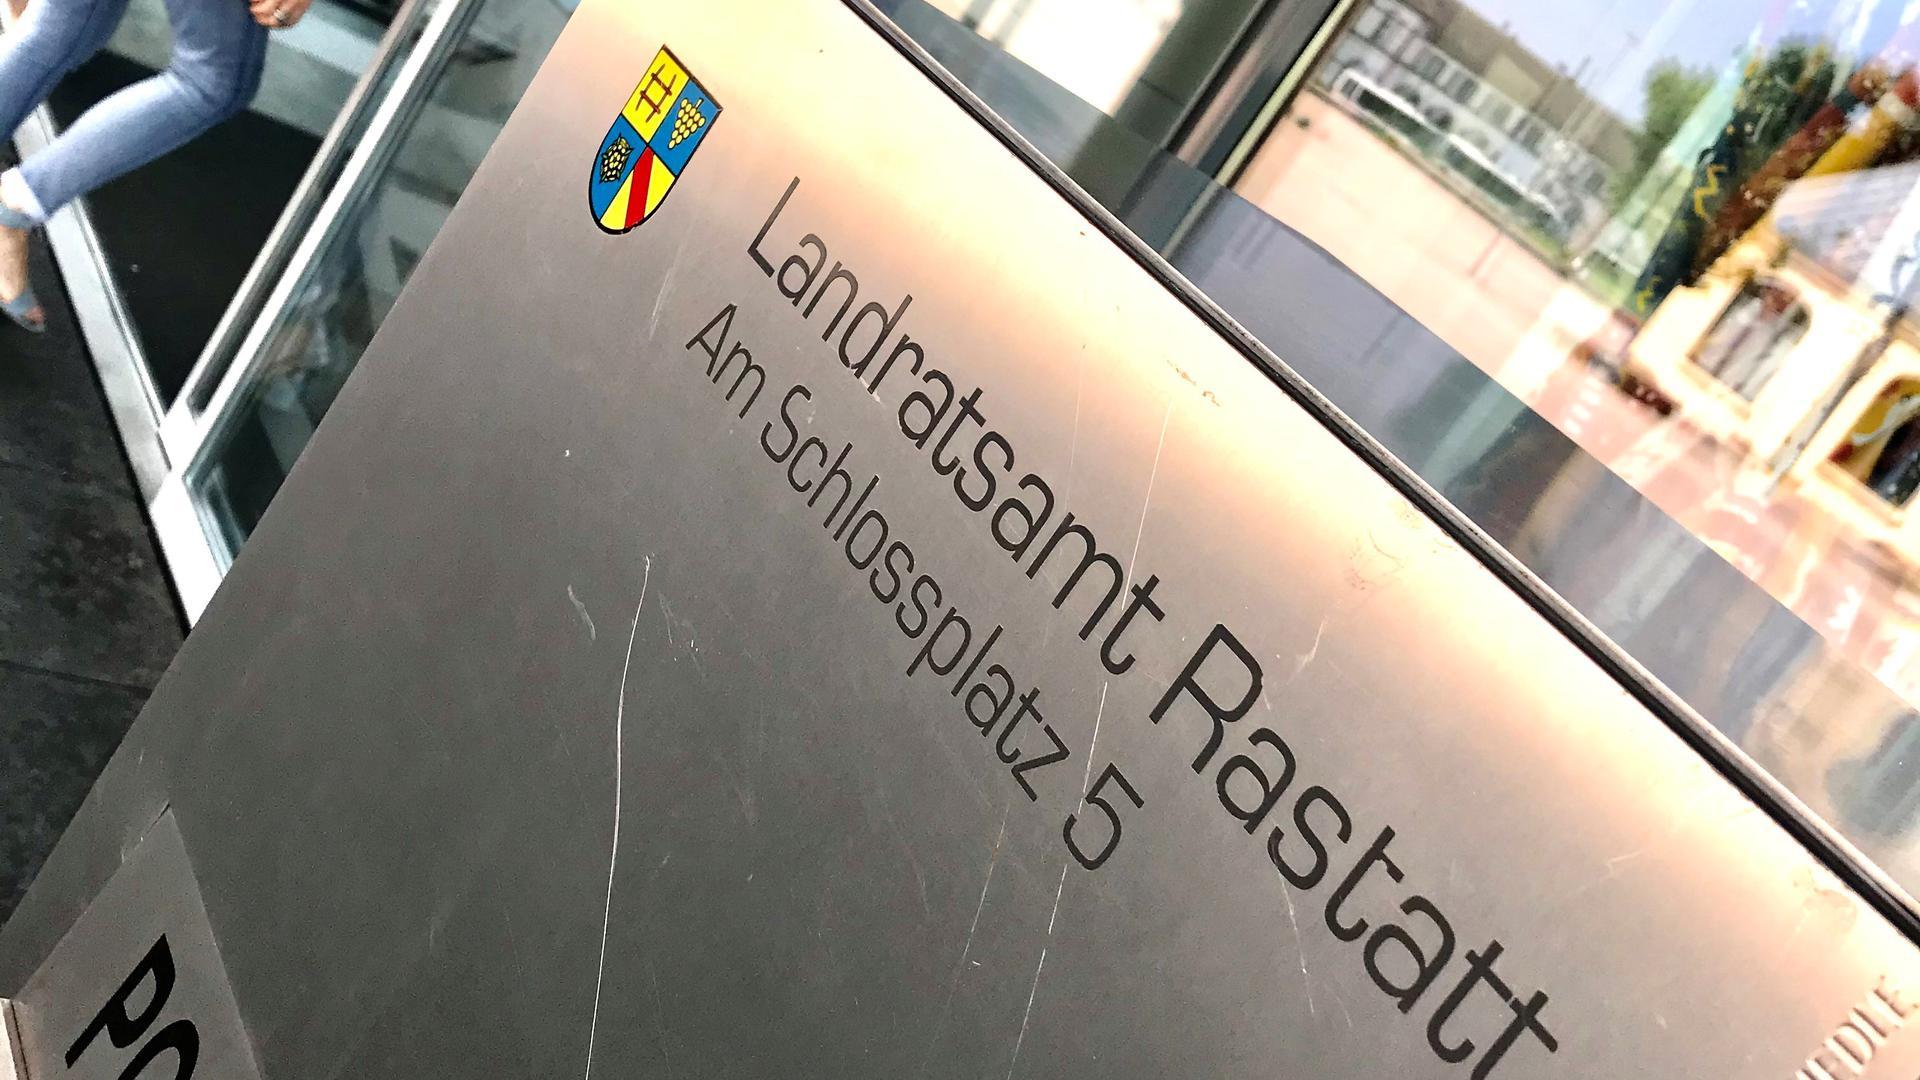 Eingangsbereich des Landratsamtes Rastatt.